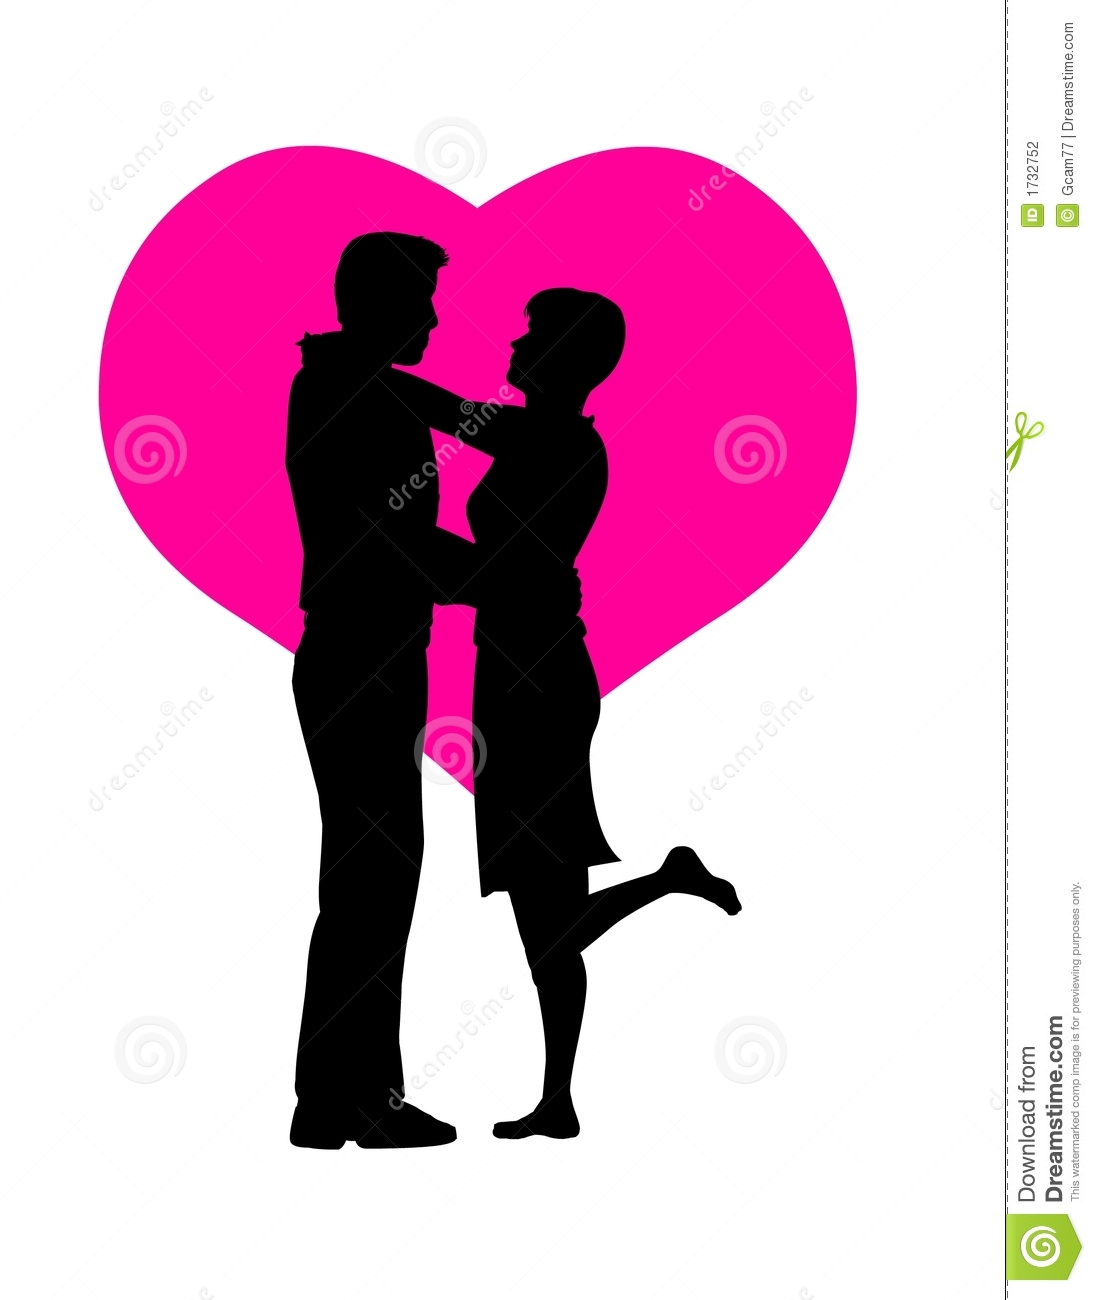 romantic couple clipart panda free clipart images rh clipartpanda com romance novel clipart romance clipart free